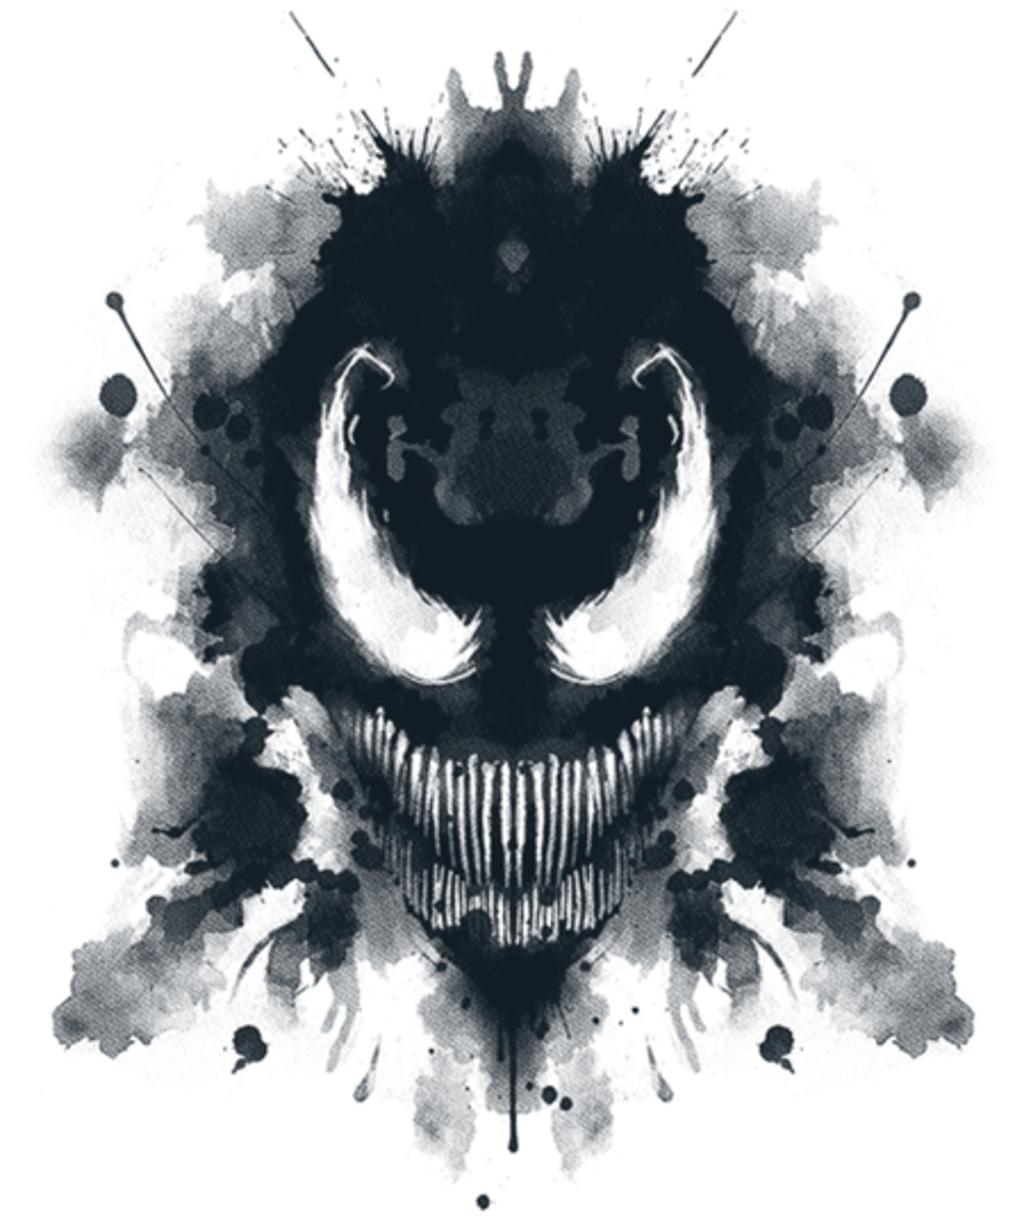 Qwertee: Symmetrical Threat